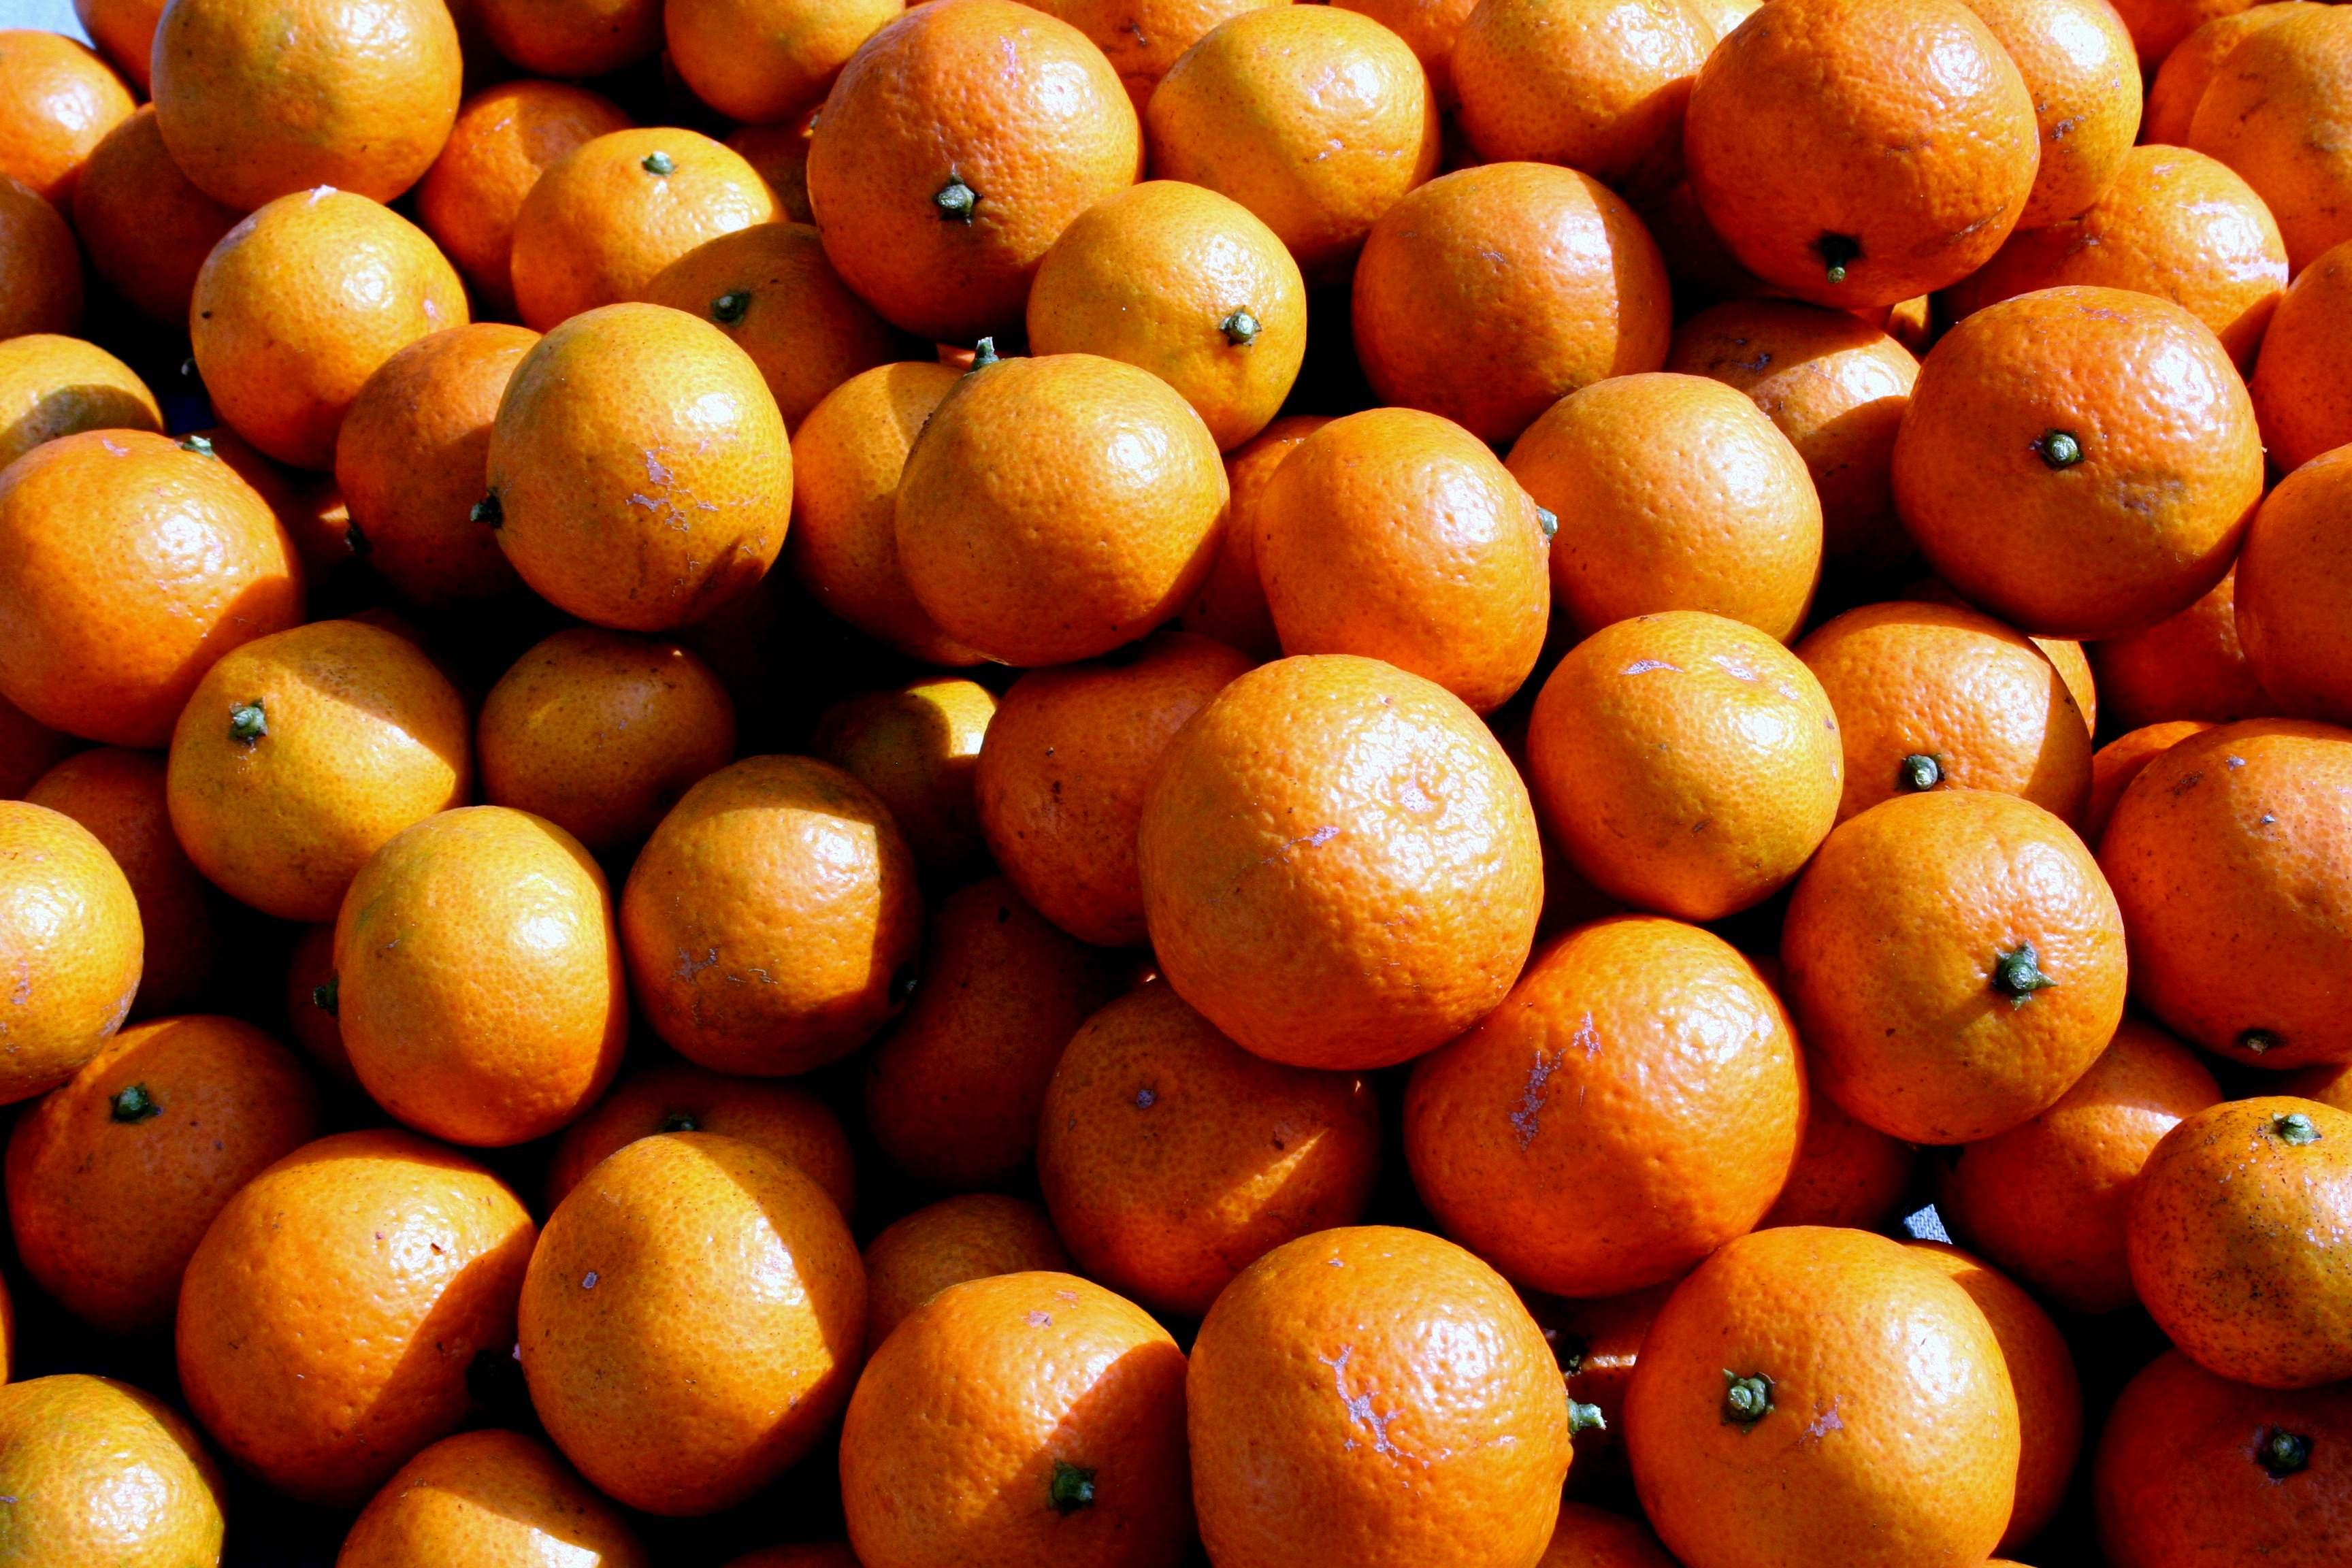 Oranges In The Blender For Cake Recipe